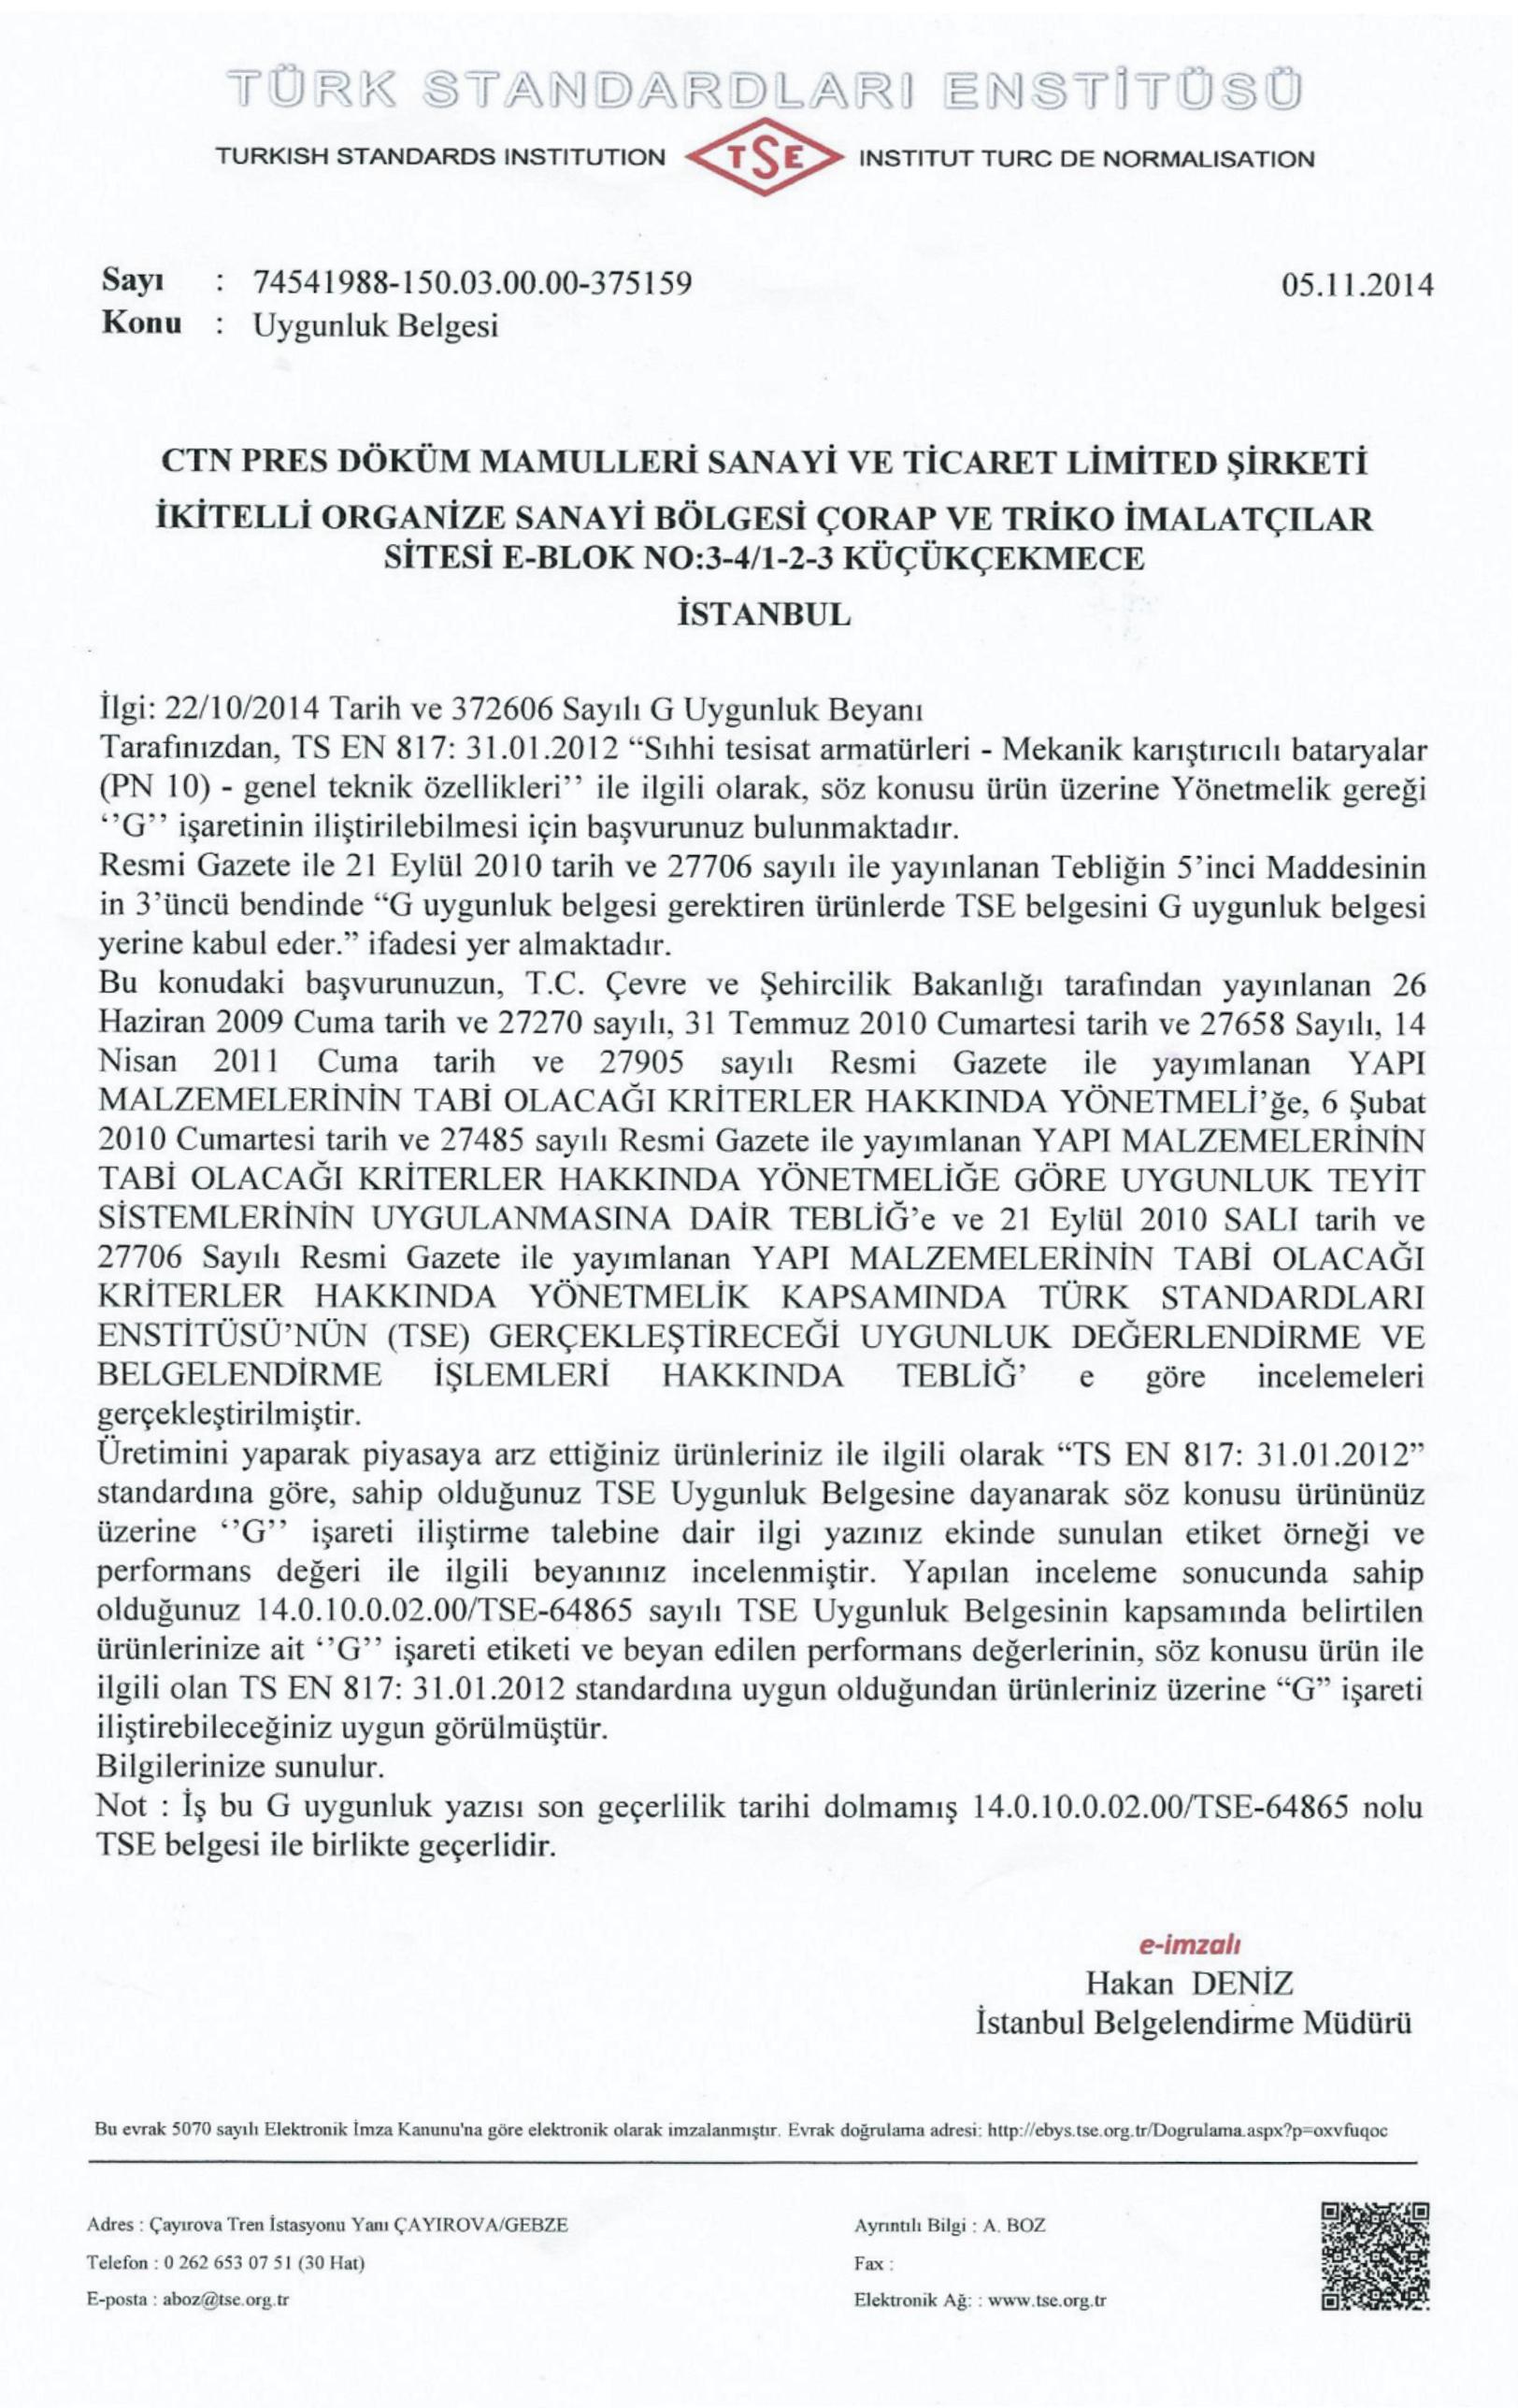 Ctn Pres Dokum Mamulleri San Ve Tic Ltd Sti